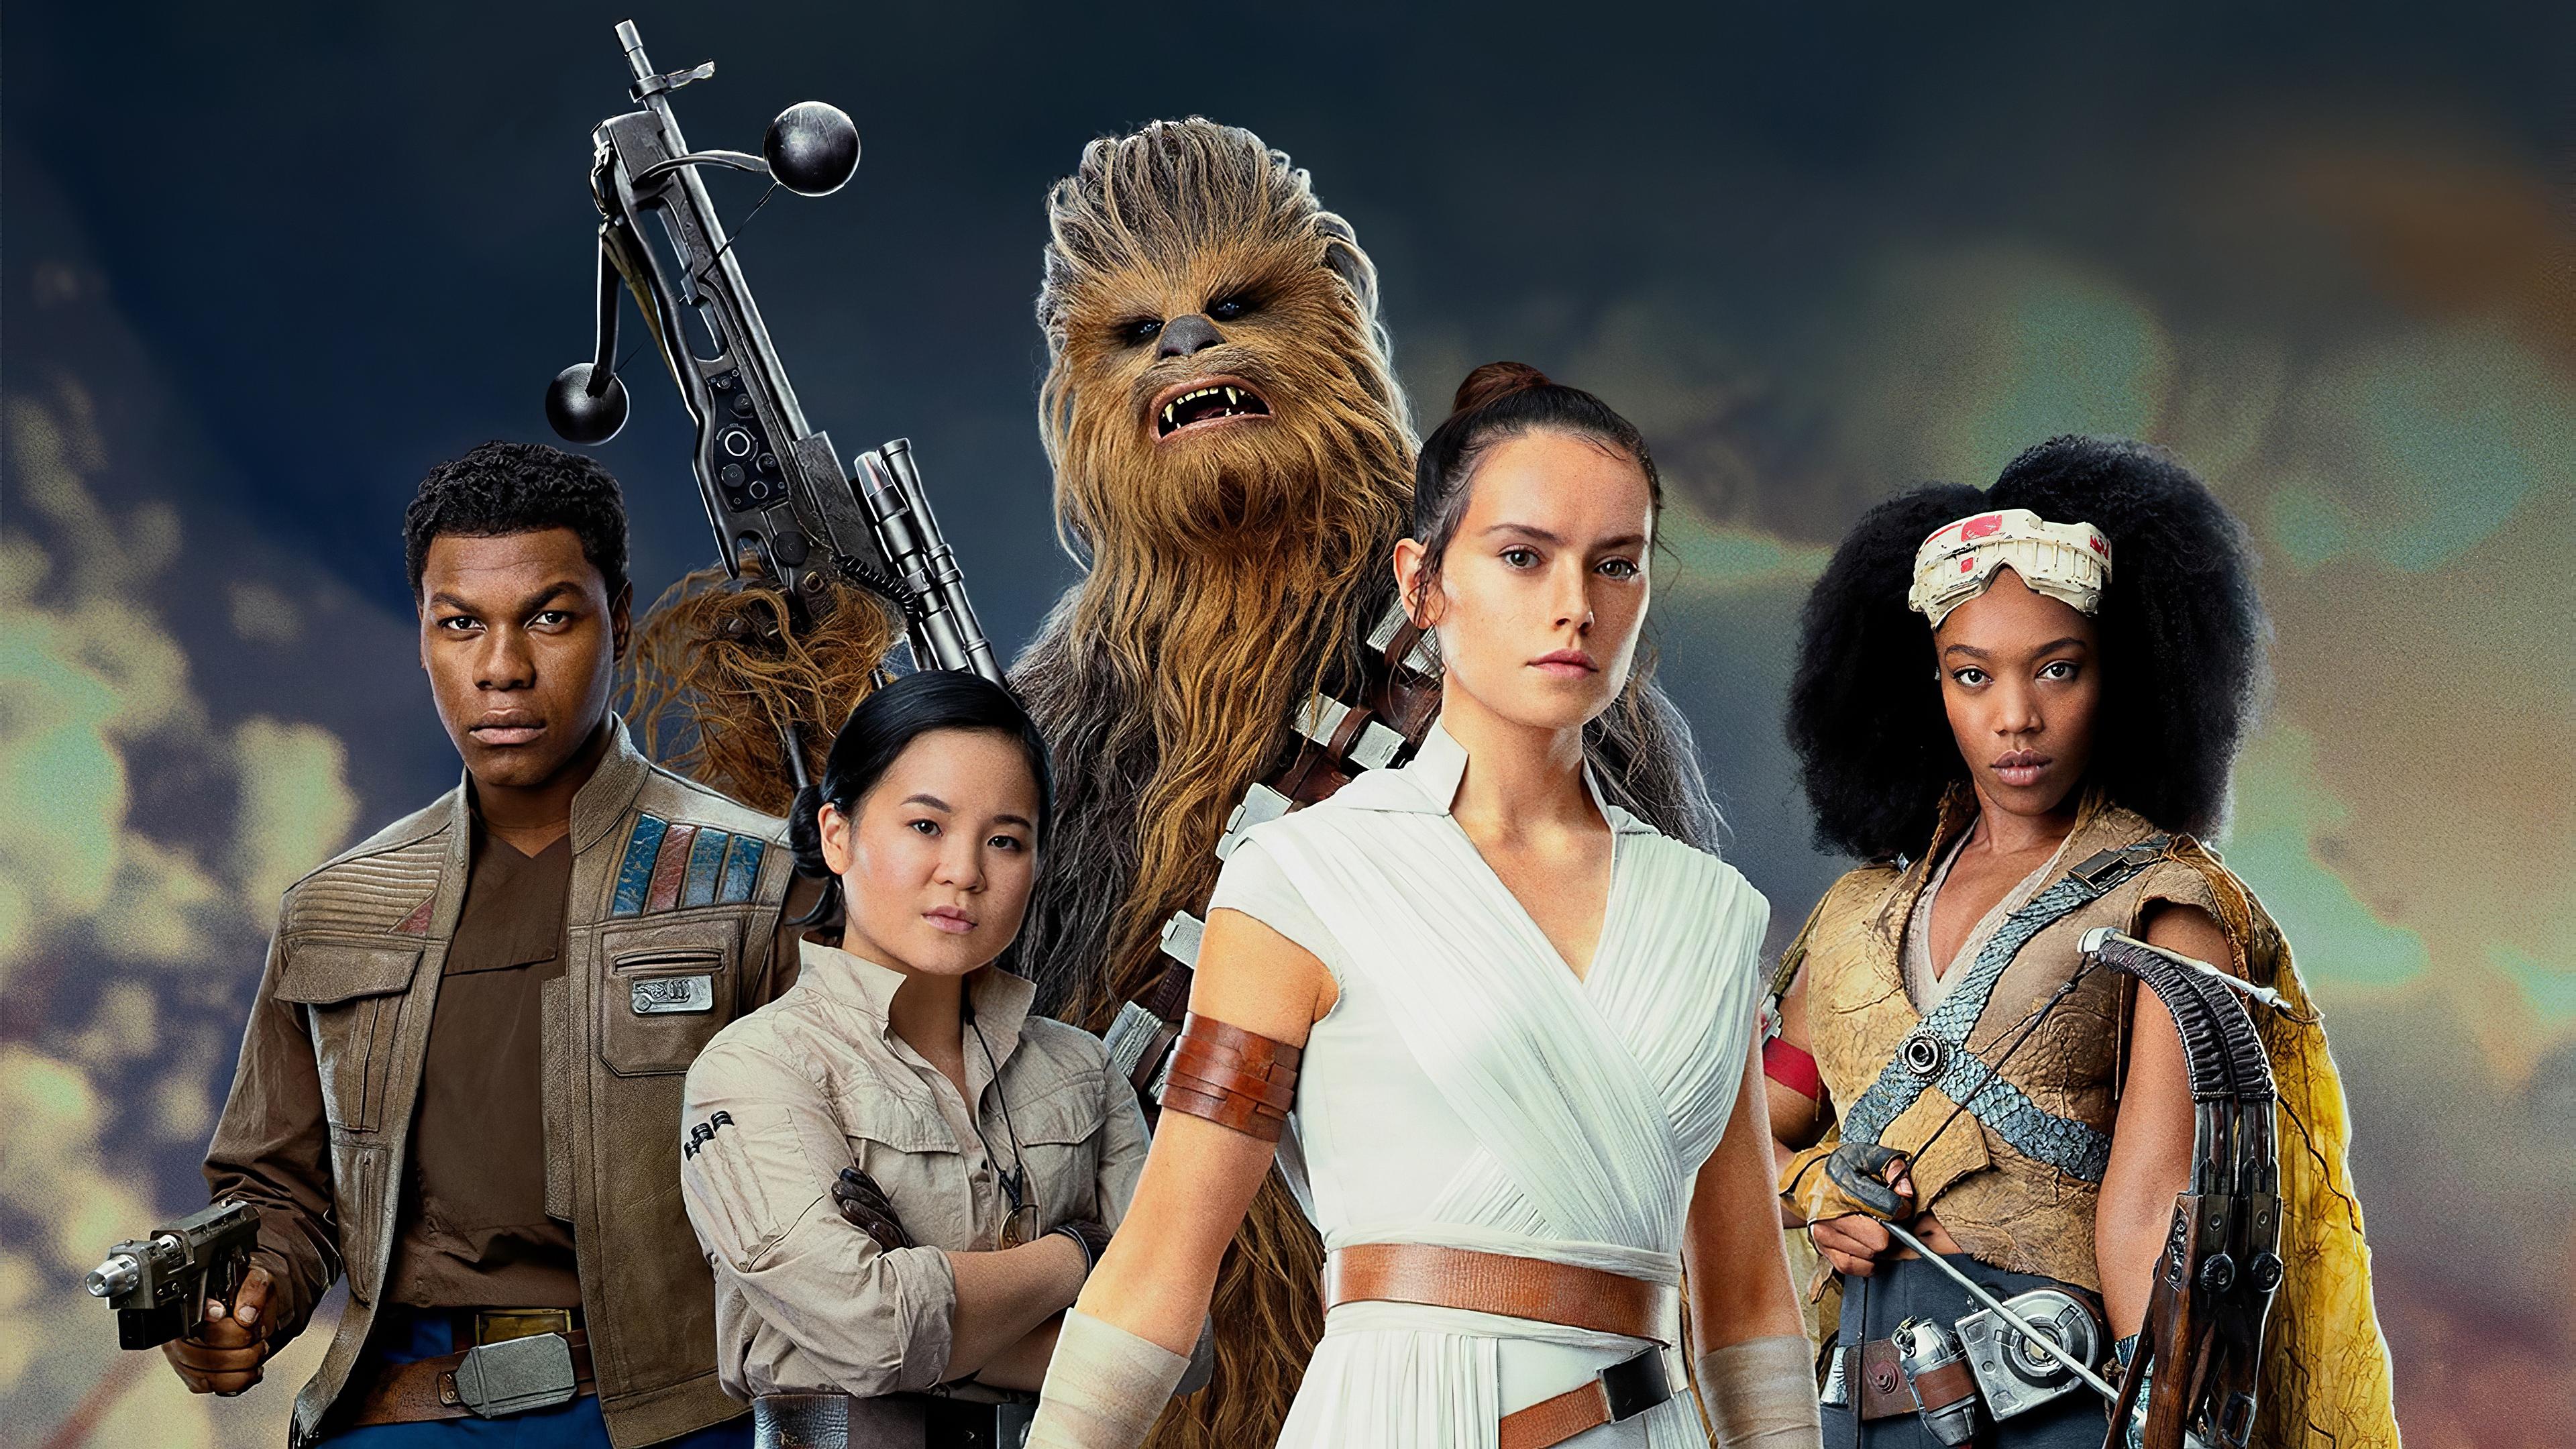 star wars the rise of skywalker tv series 1575659841 - Star Wars The Rise Of Skywalker Tv Series -